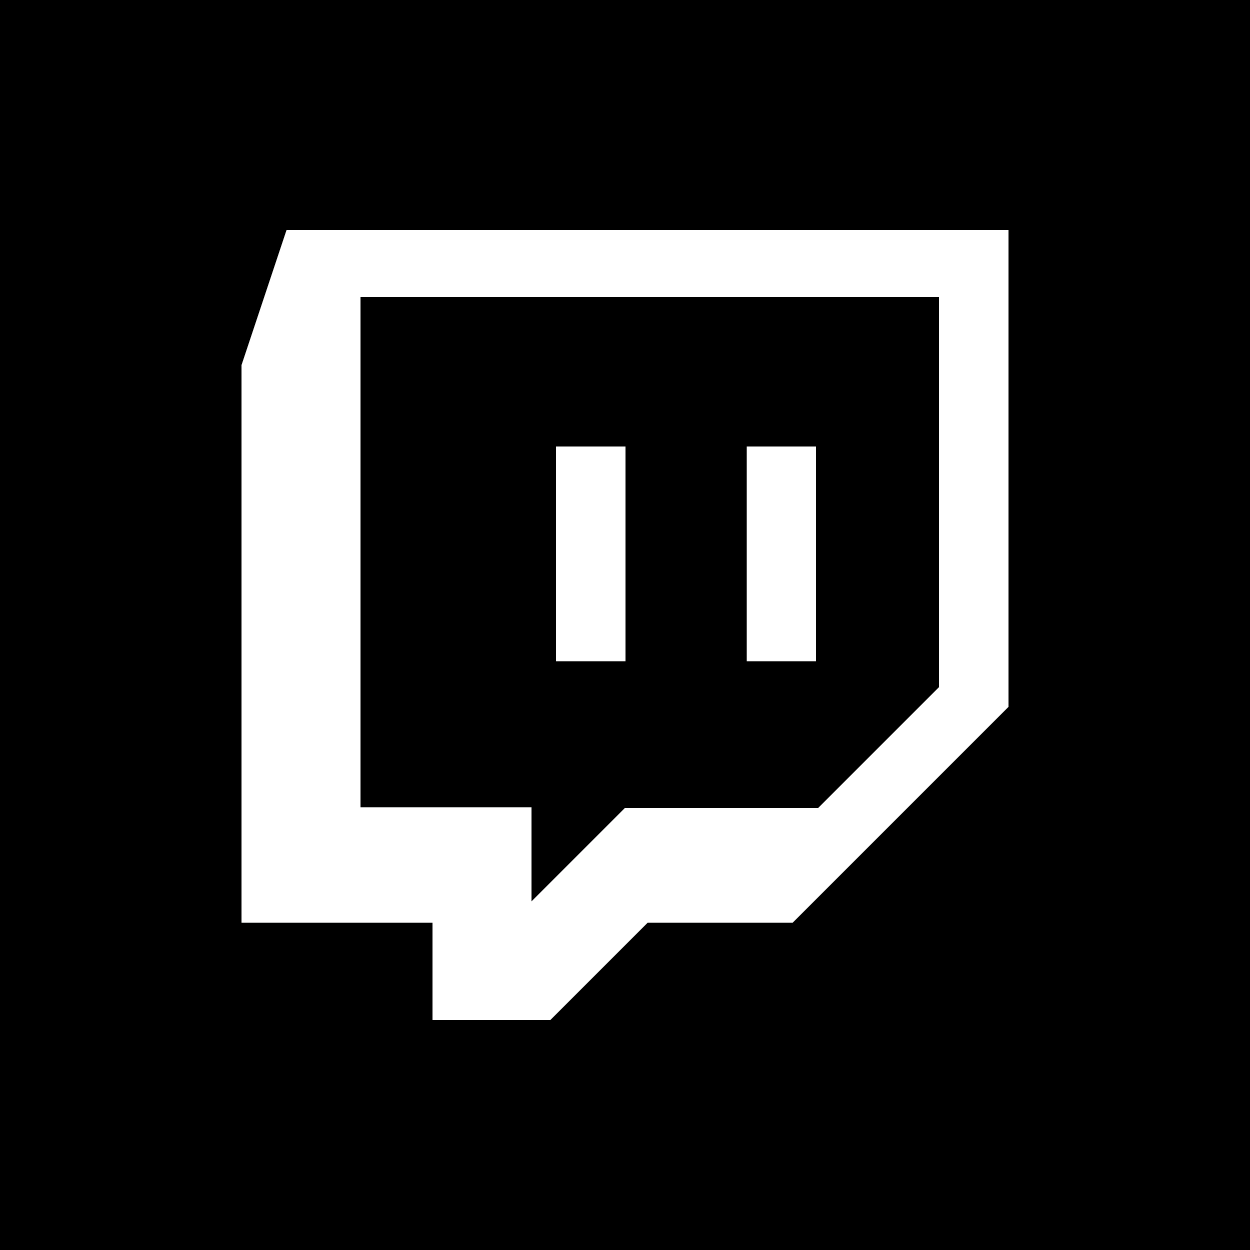 Twitch_Logo_Black_Square.png